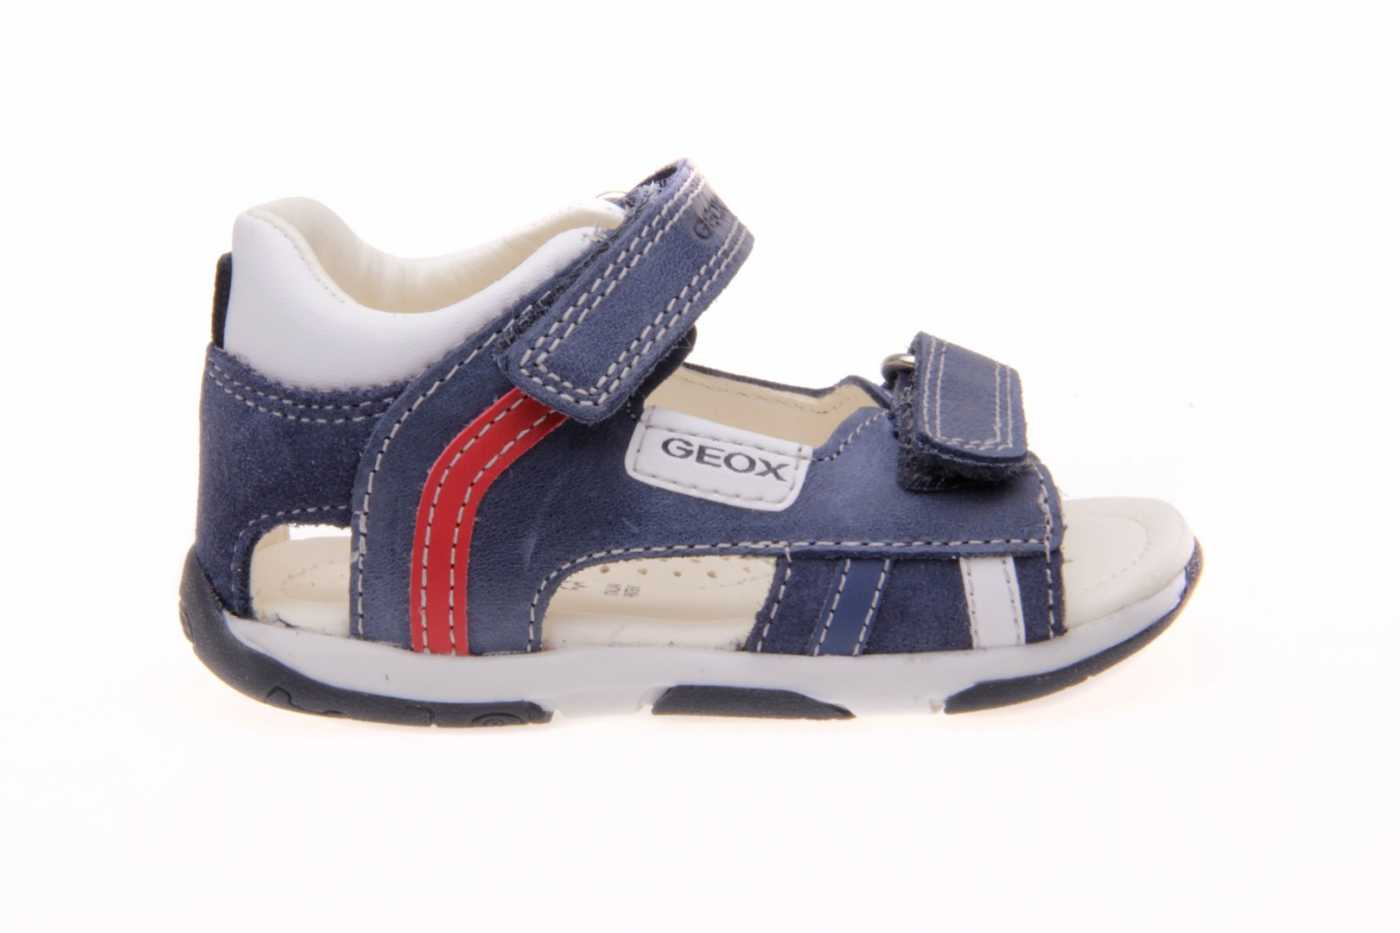 zapatos geox fiesta infantil